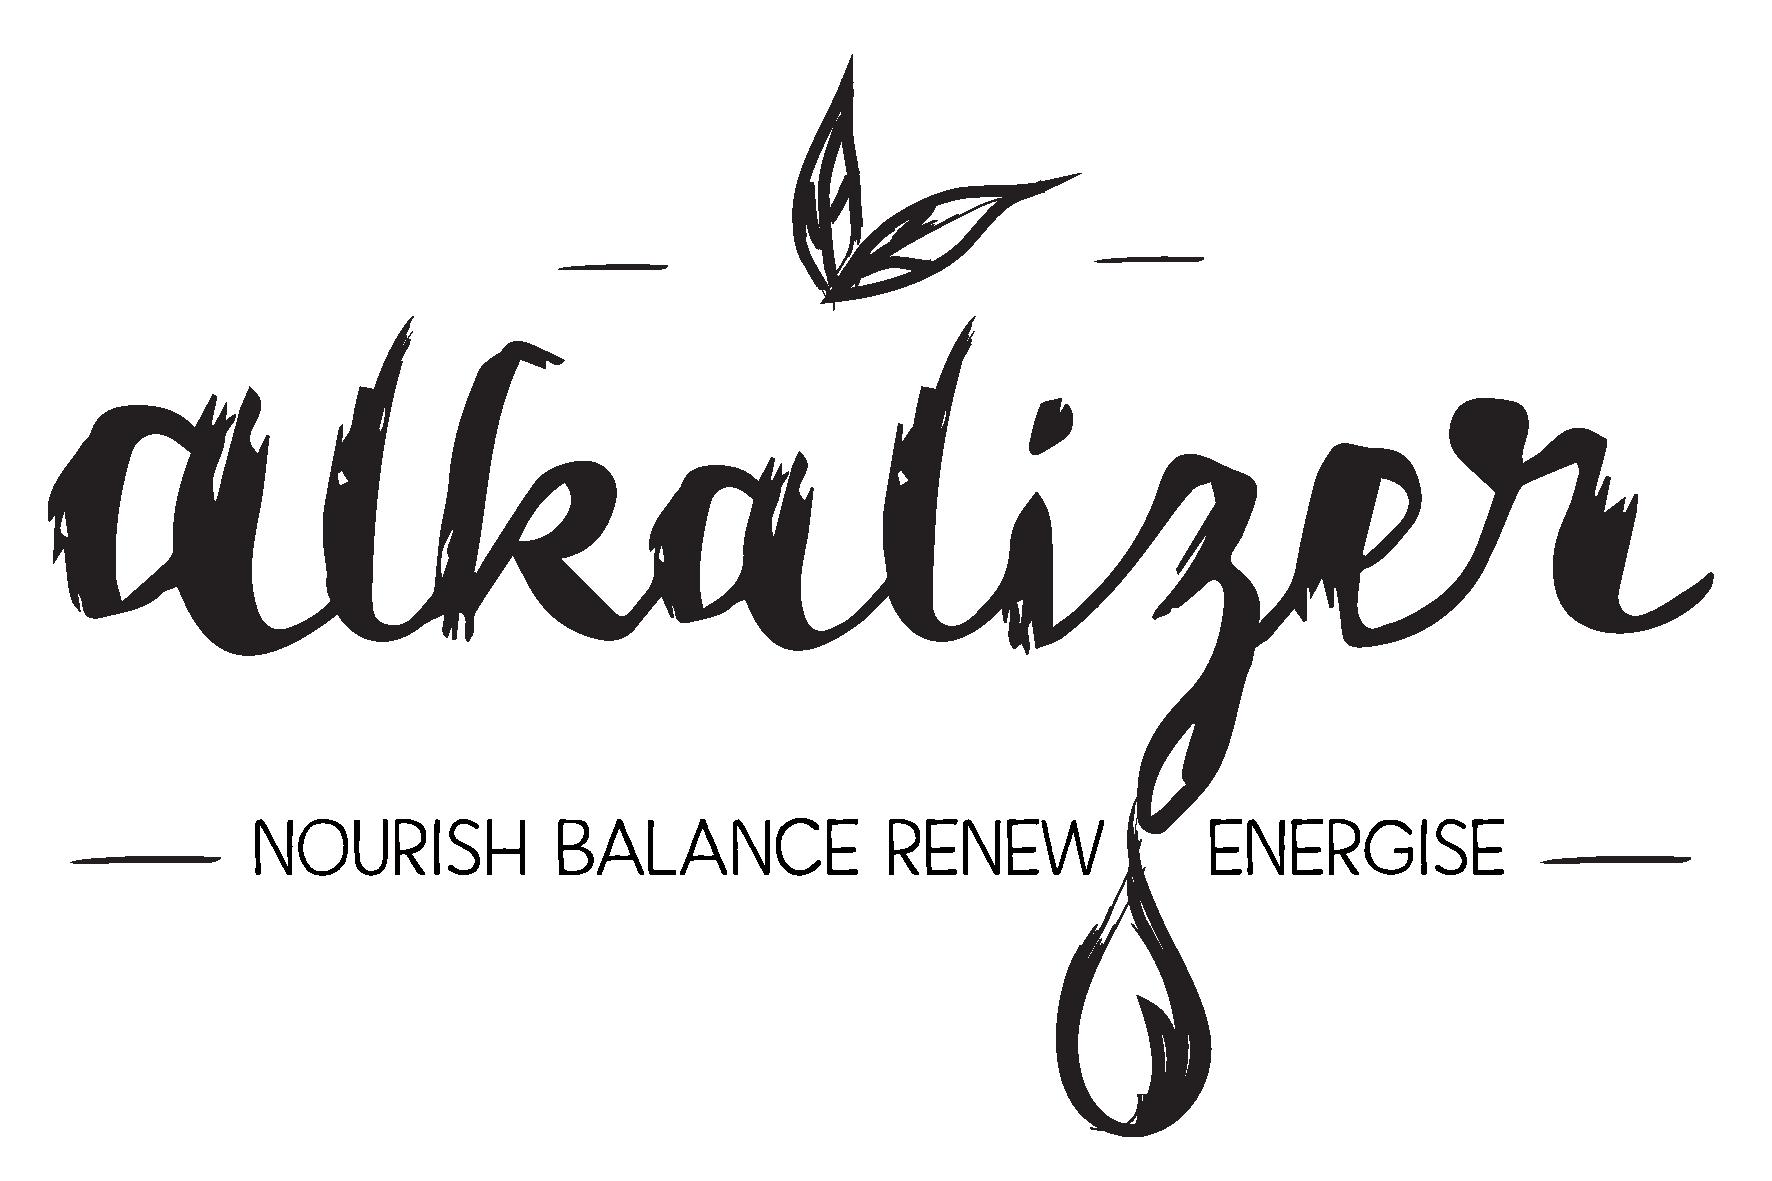 Alkalizer logo